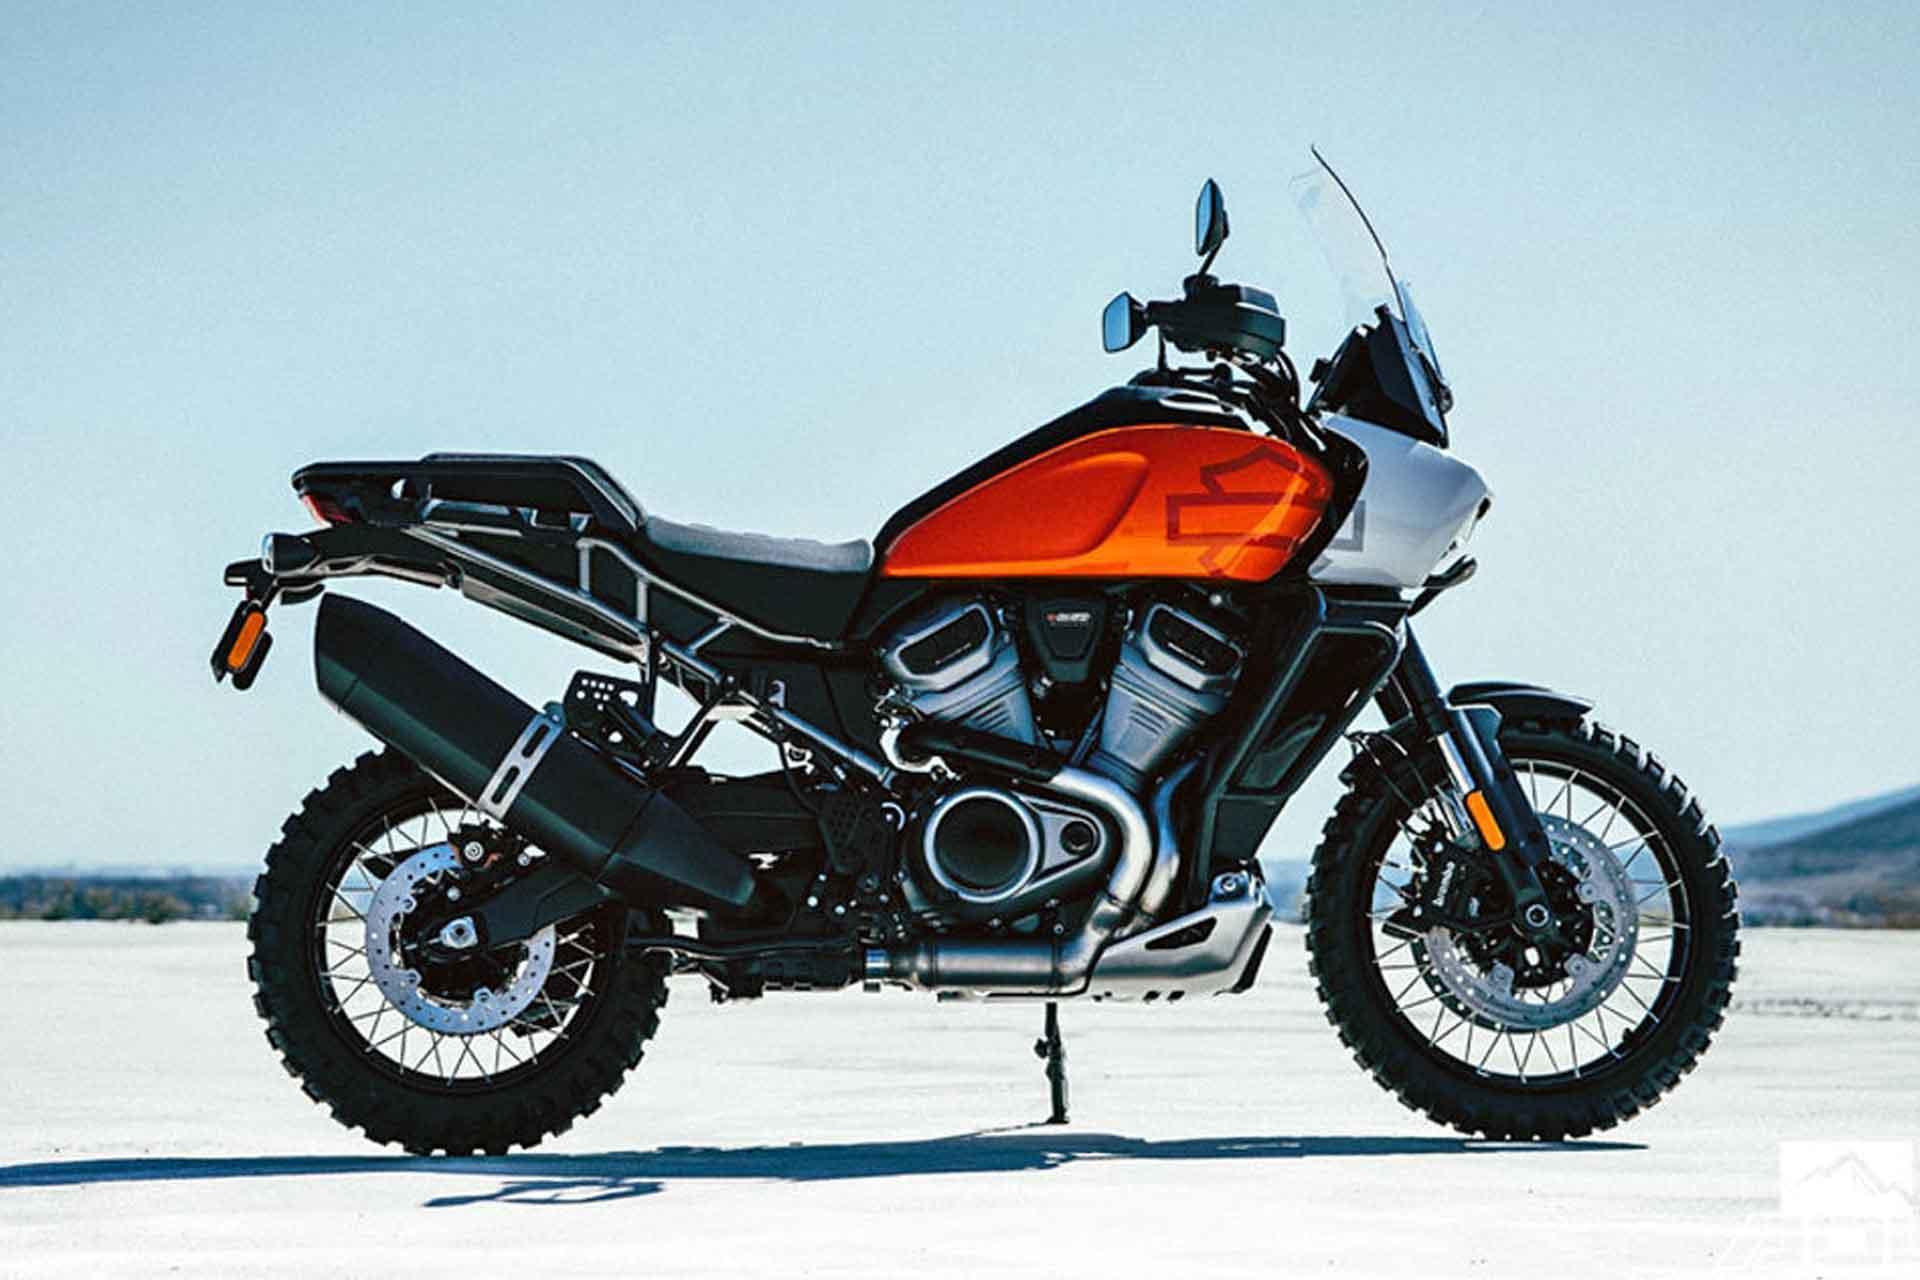 Harley-Davidson Pan America Adventure Motorcycle